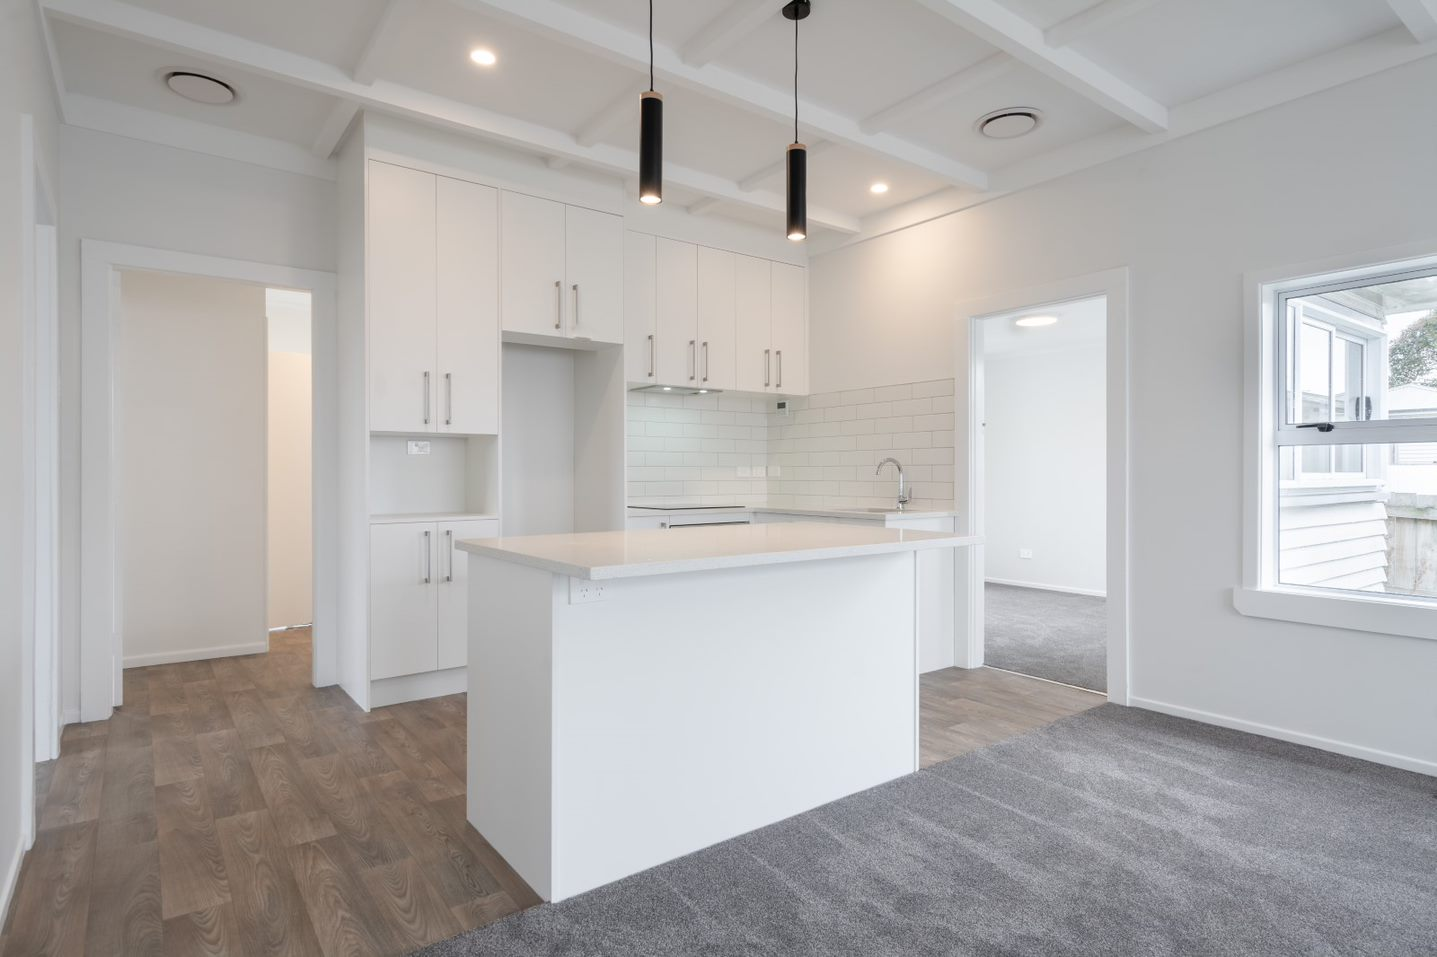 Cinderella of real estate – Papatoetoe house renovation